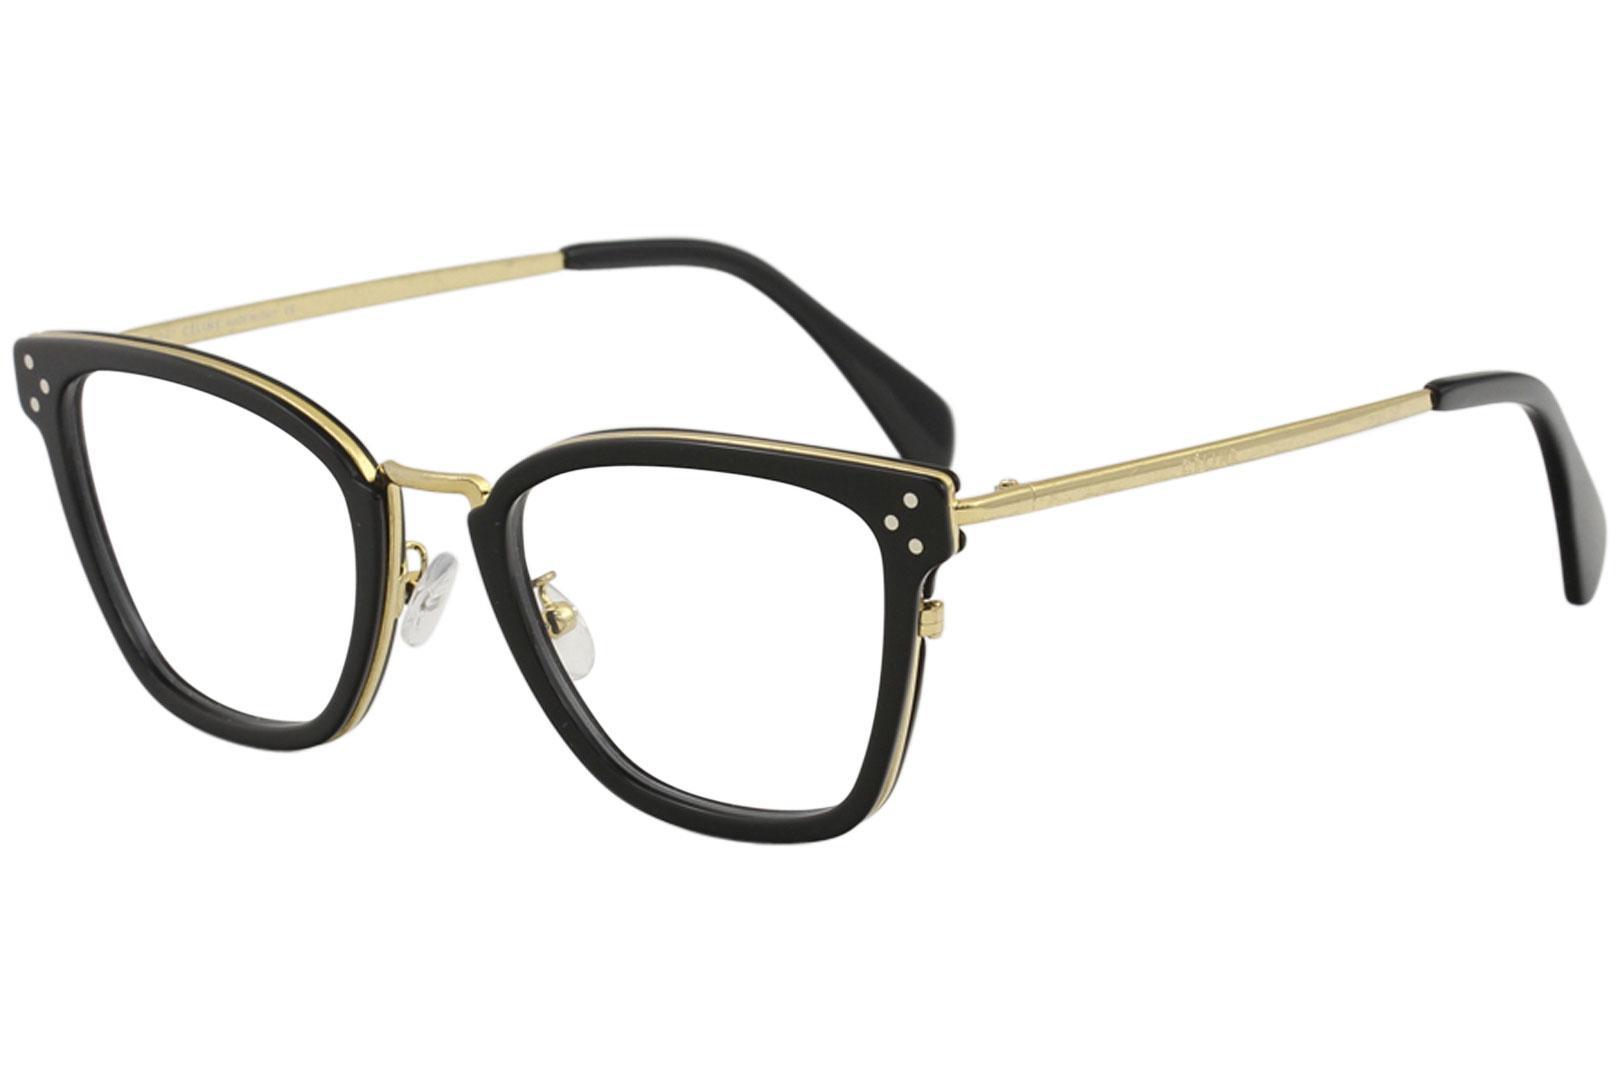 c12f1a1cf36 Celine Women s Eyeglasses CL50002U CL 50002 U Full Rim Optical Frame